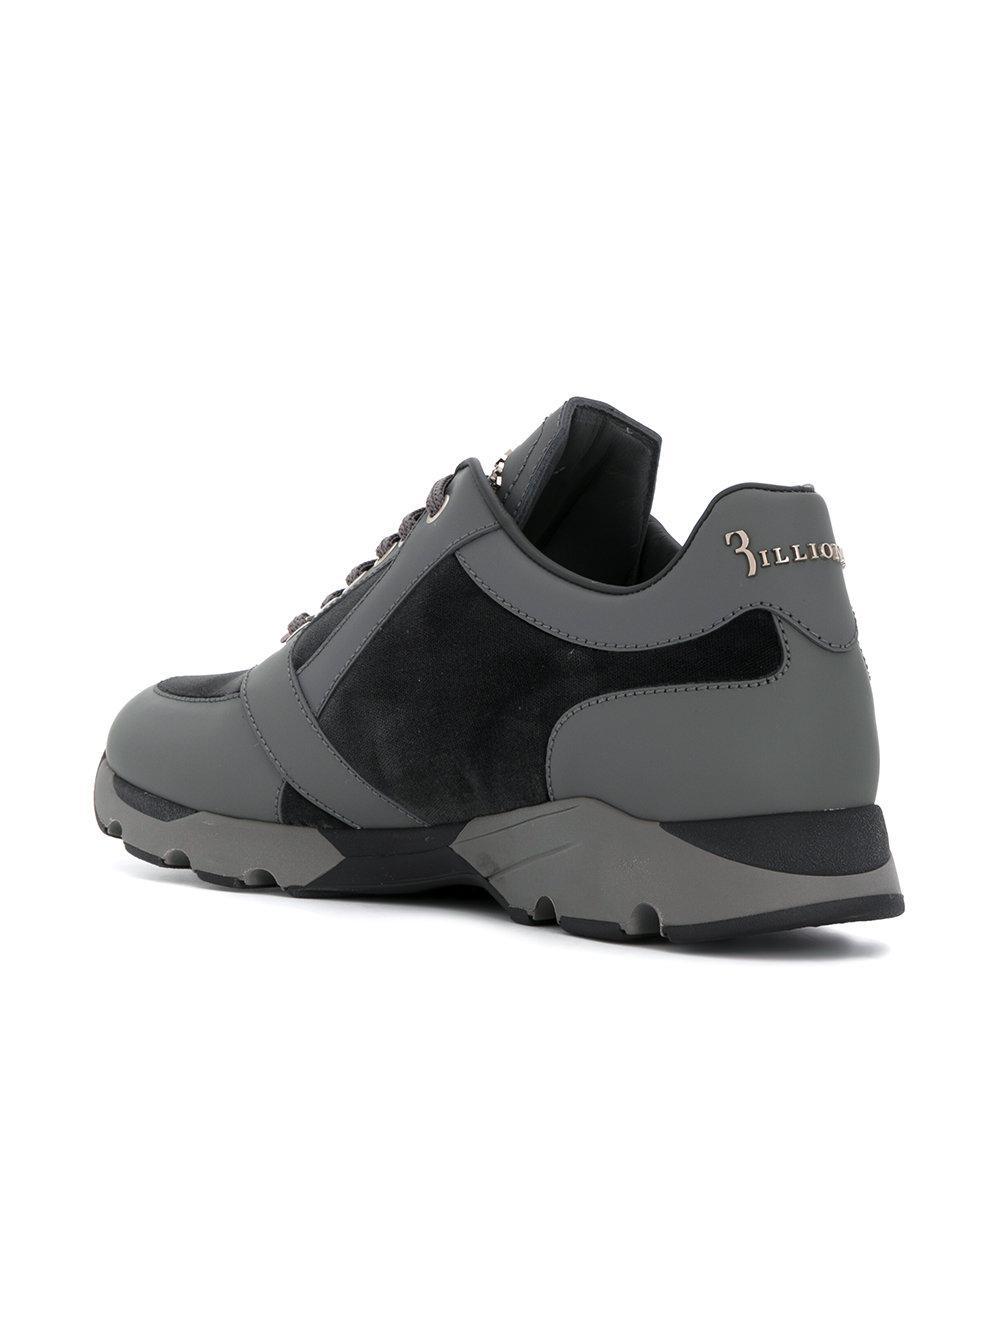 Lyst Billionaire Panelled Sneakers In Gray For Men